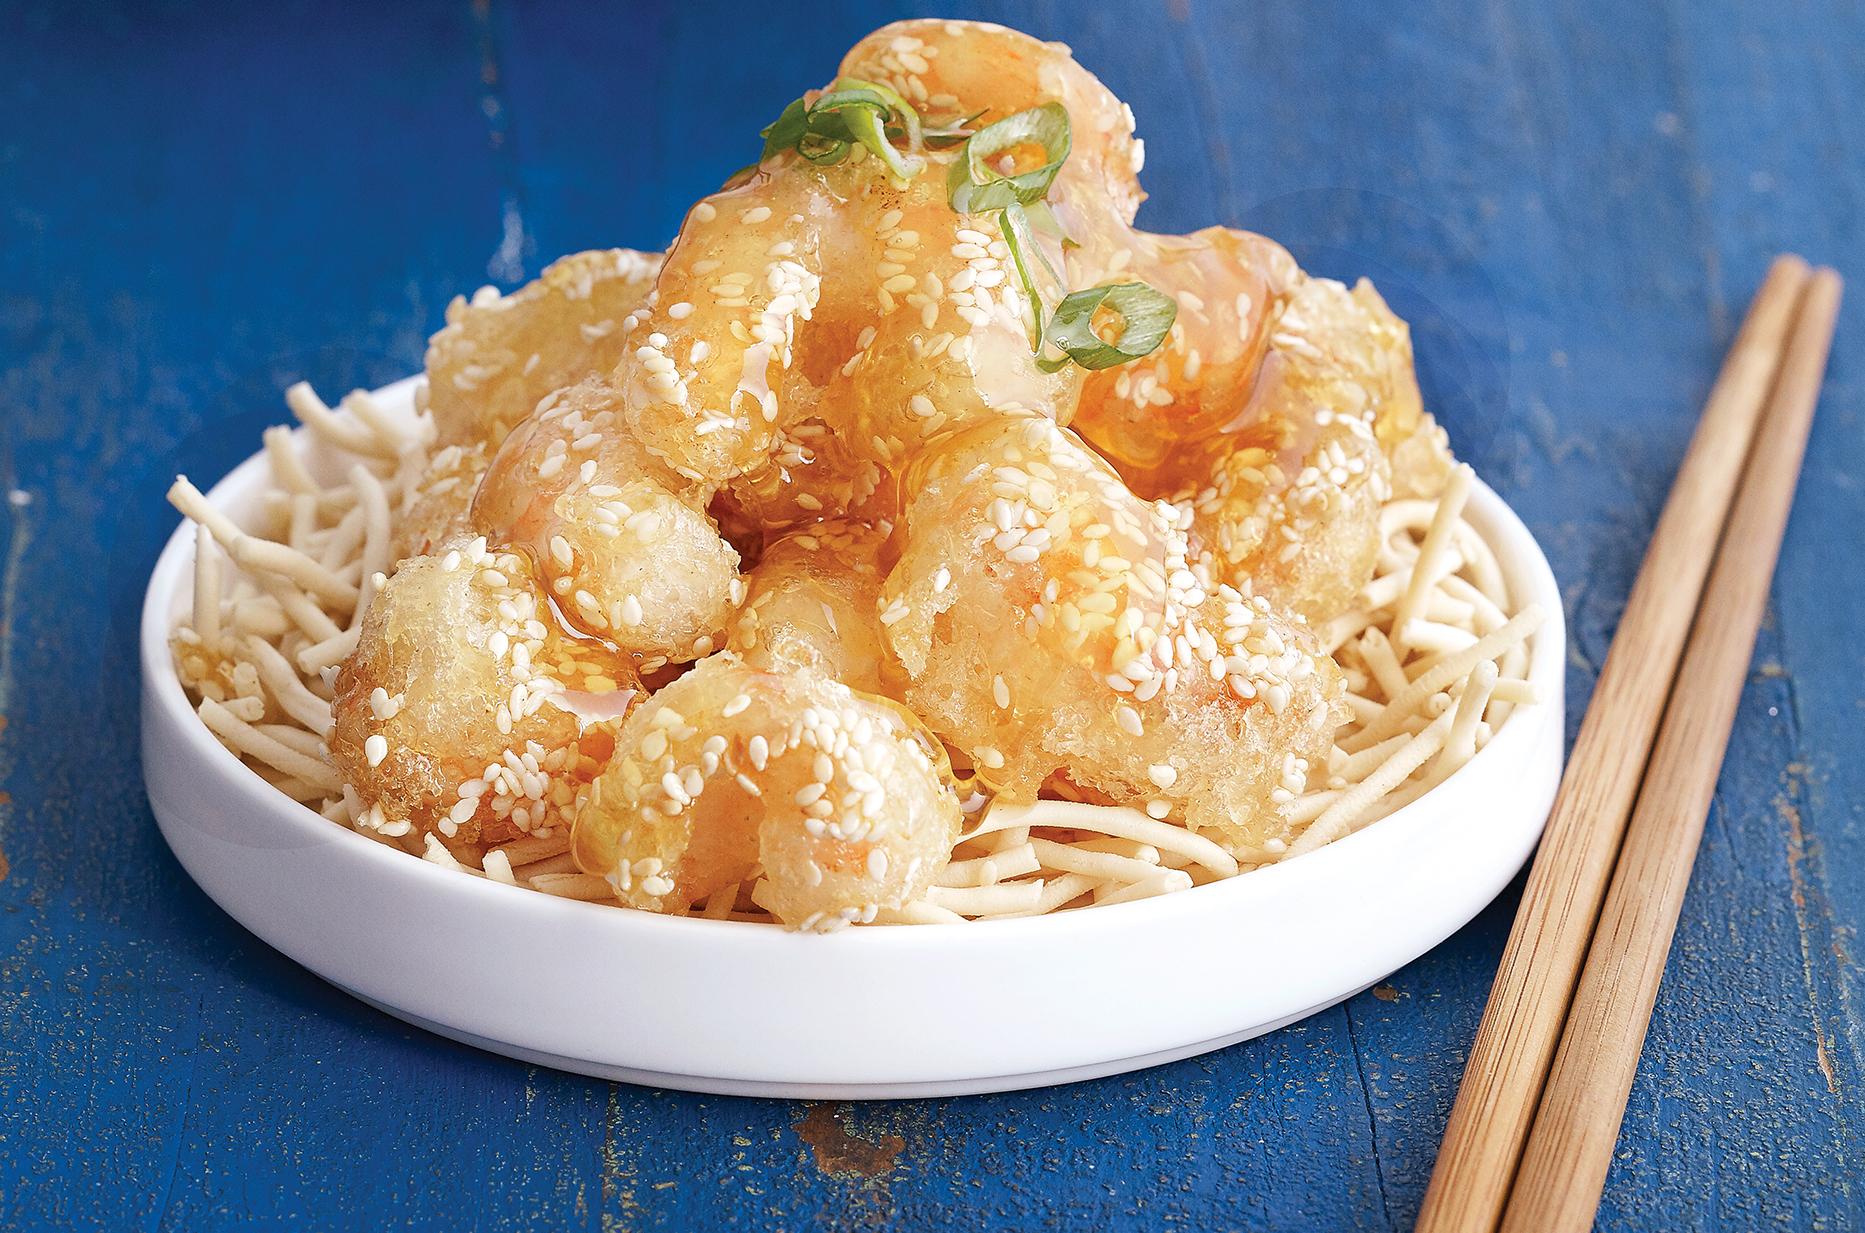 A platter of crispy gluten-free honey prawns sitting on crispy rice noodles with chopsticks on a blue board